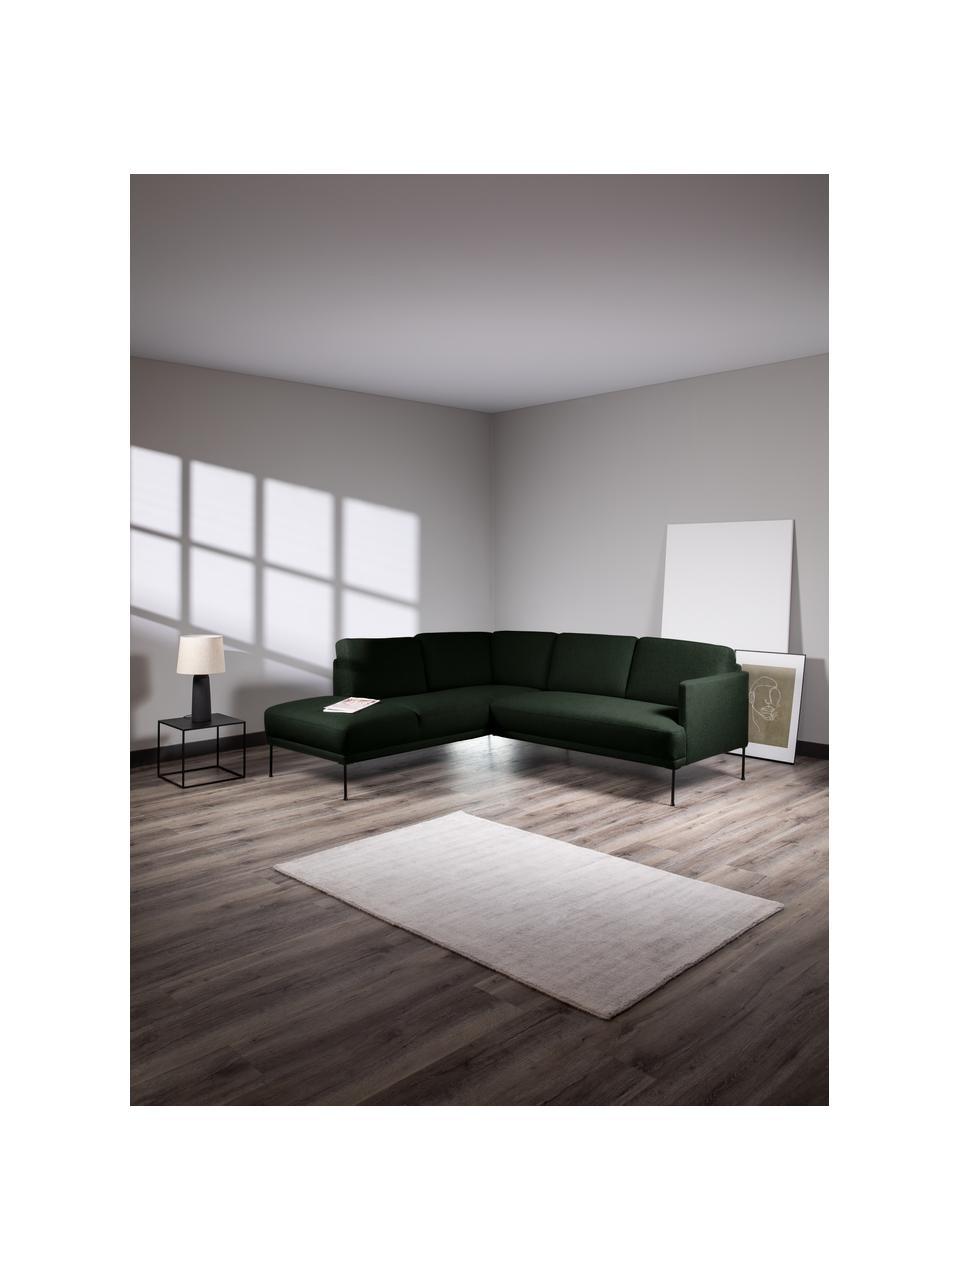 Canapé d'angle tissu vert foncé pieds en métal Fluente, Tissu vert foncé